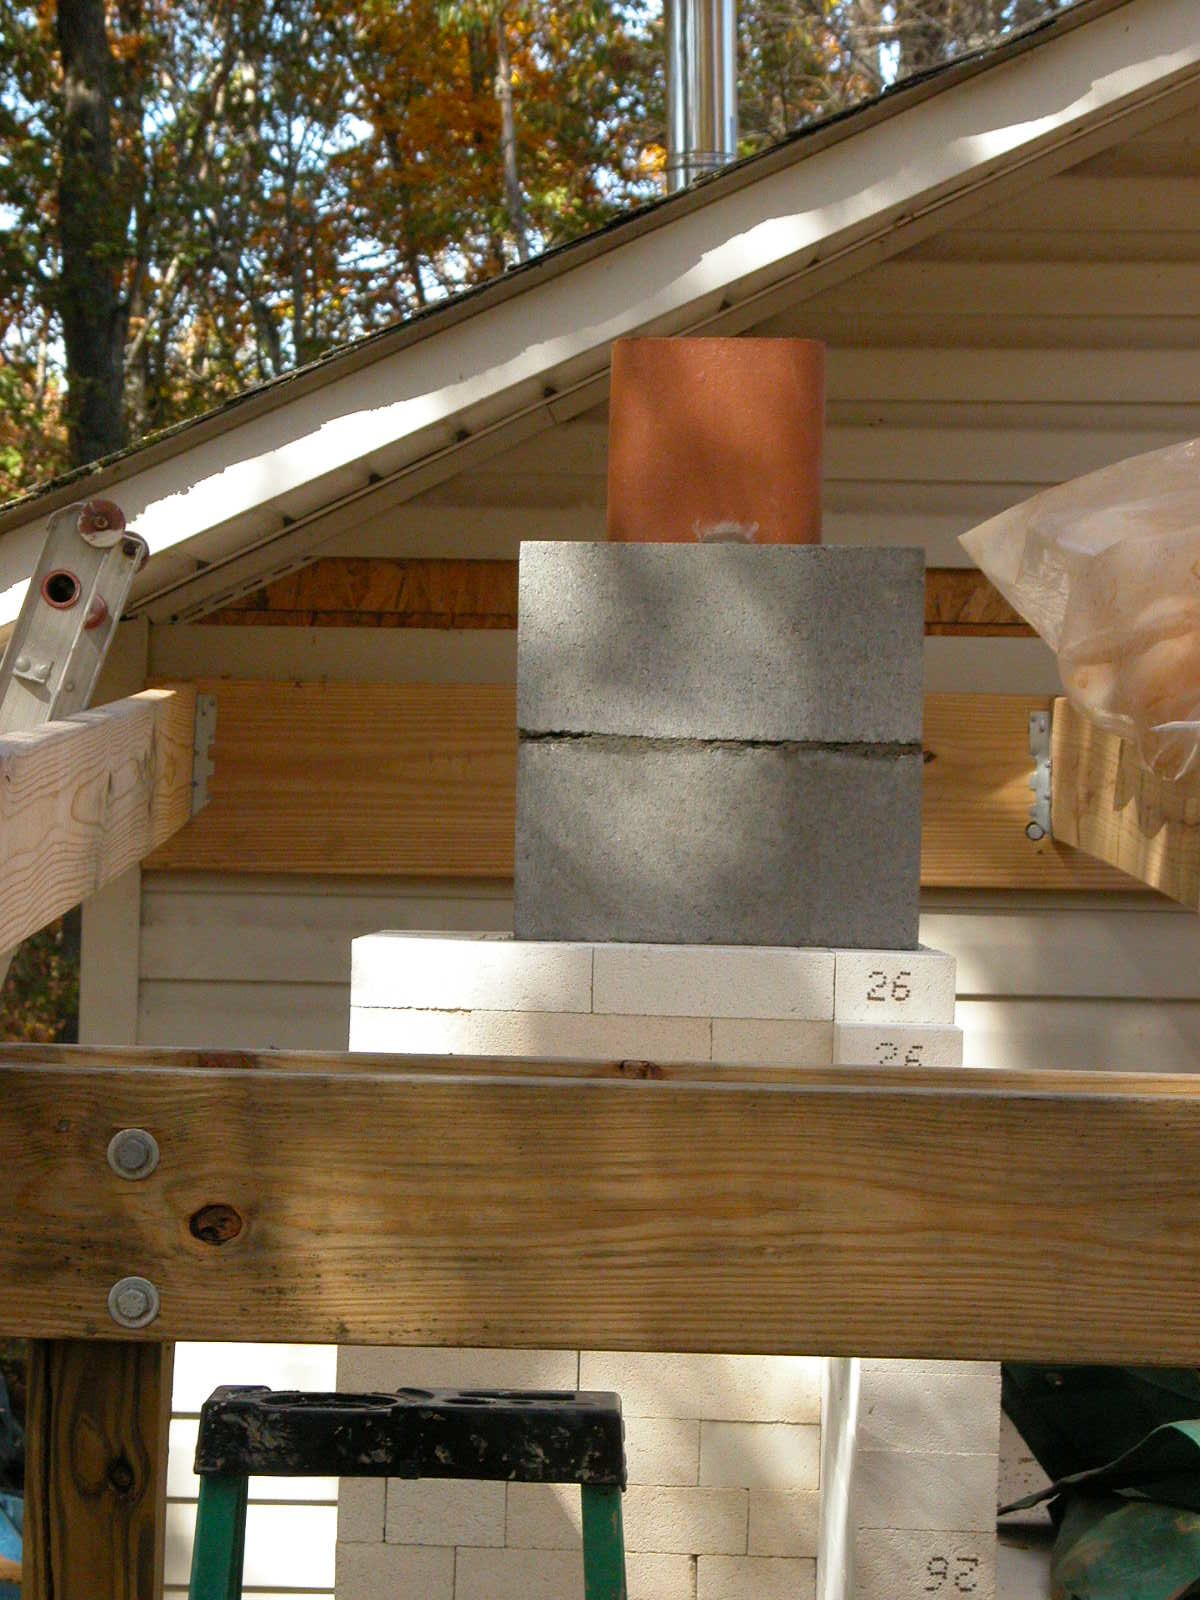 Kiln Project November 2011